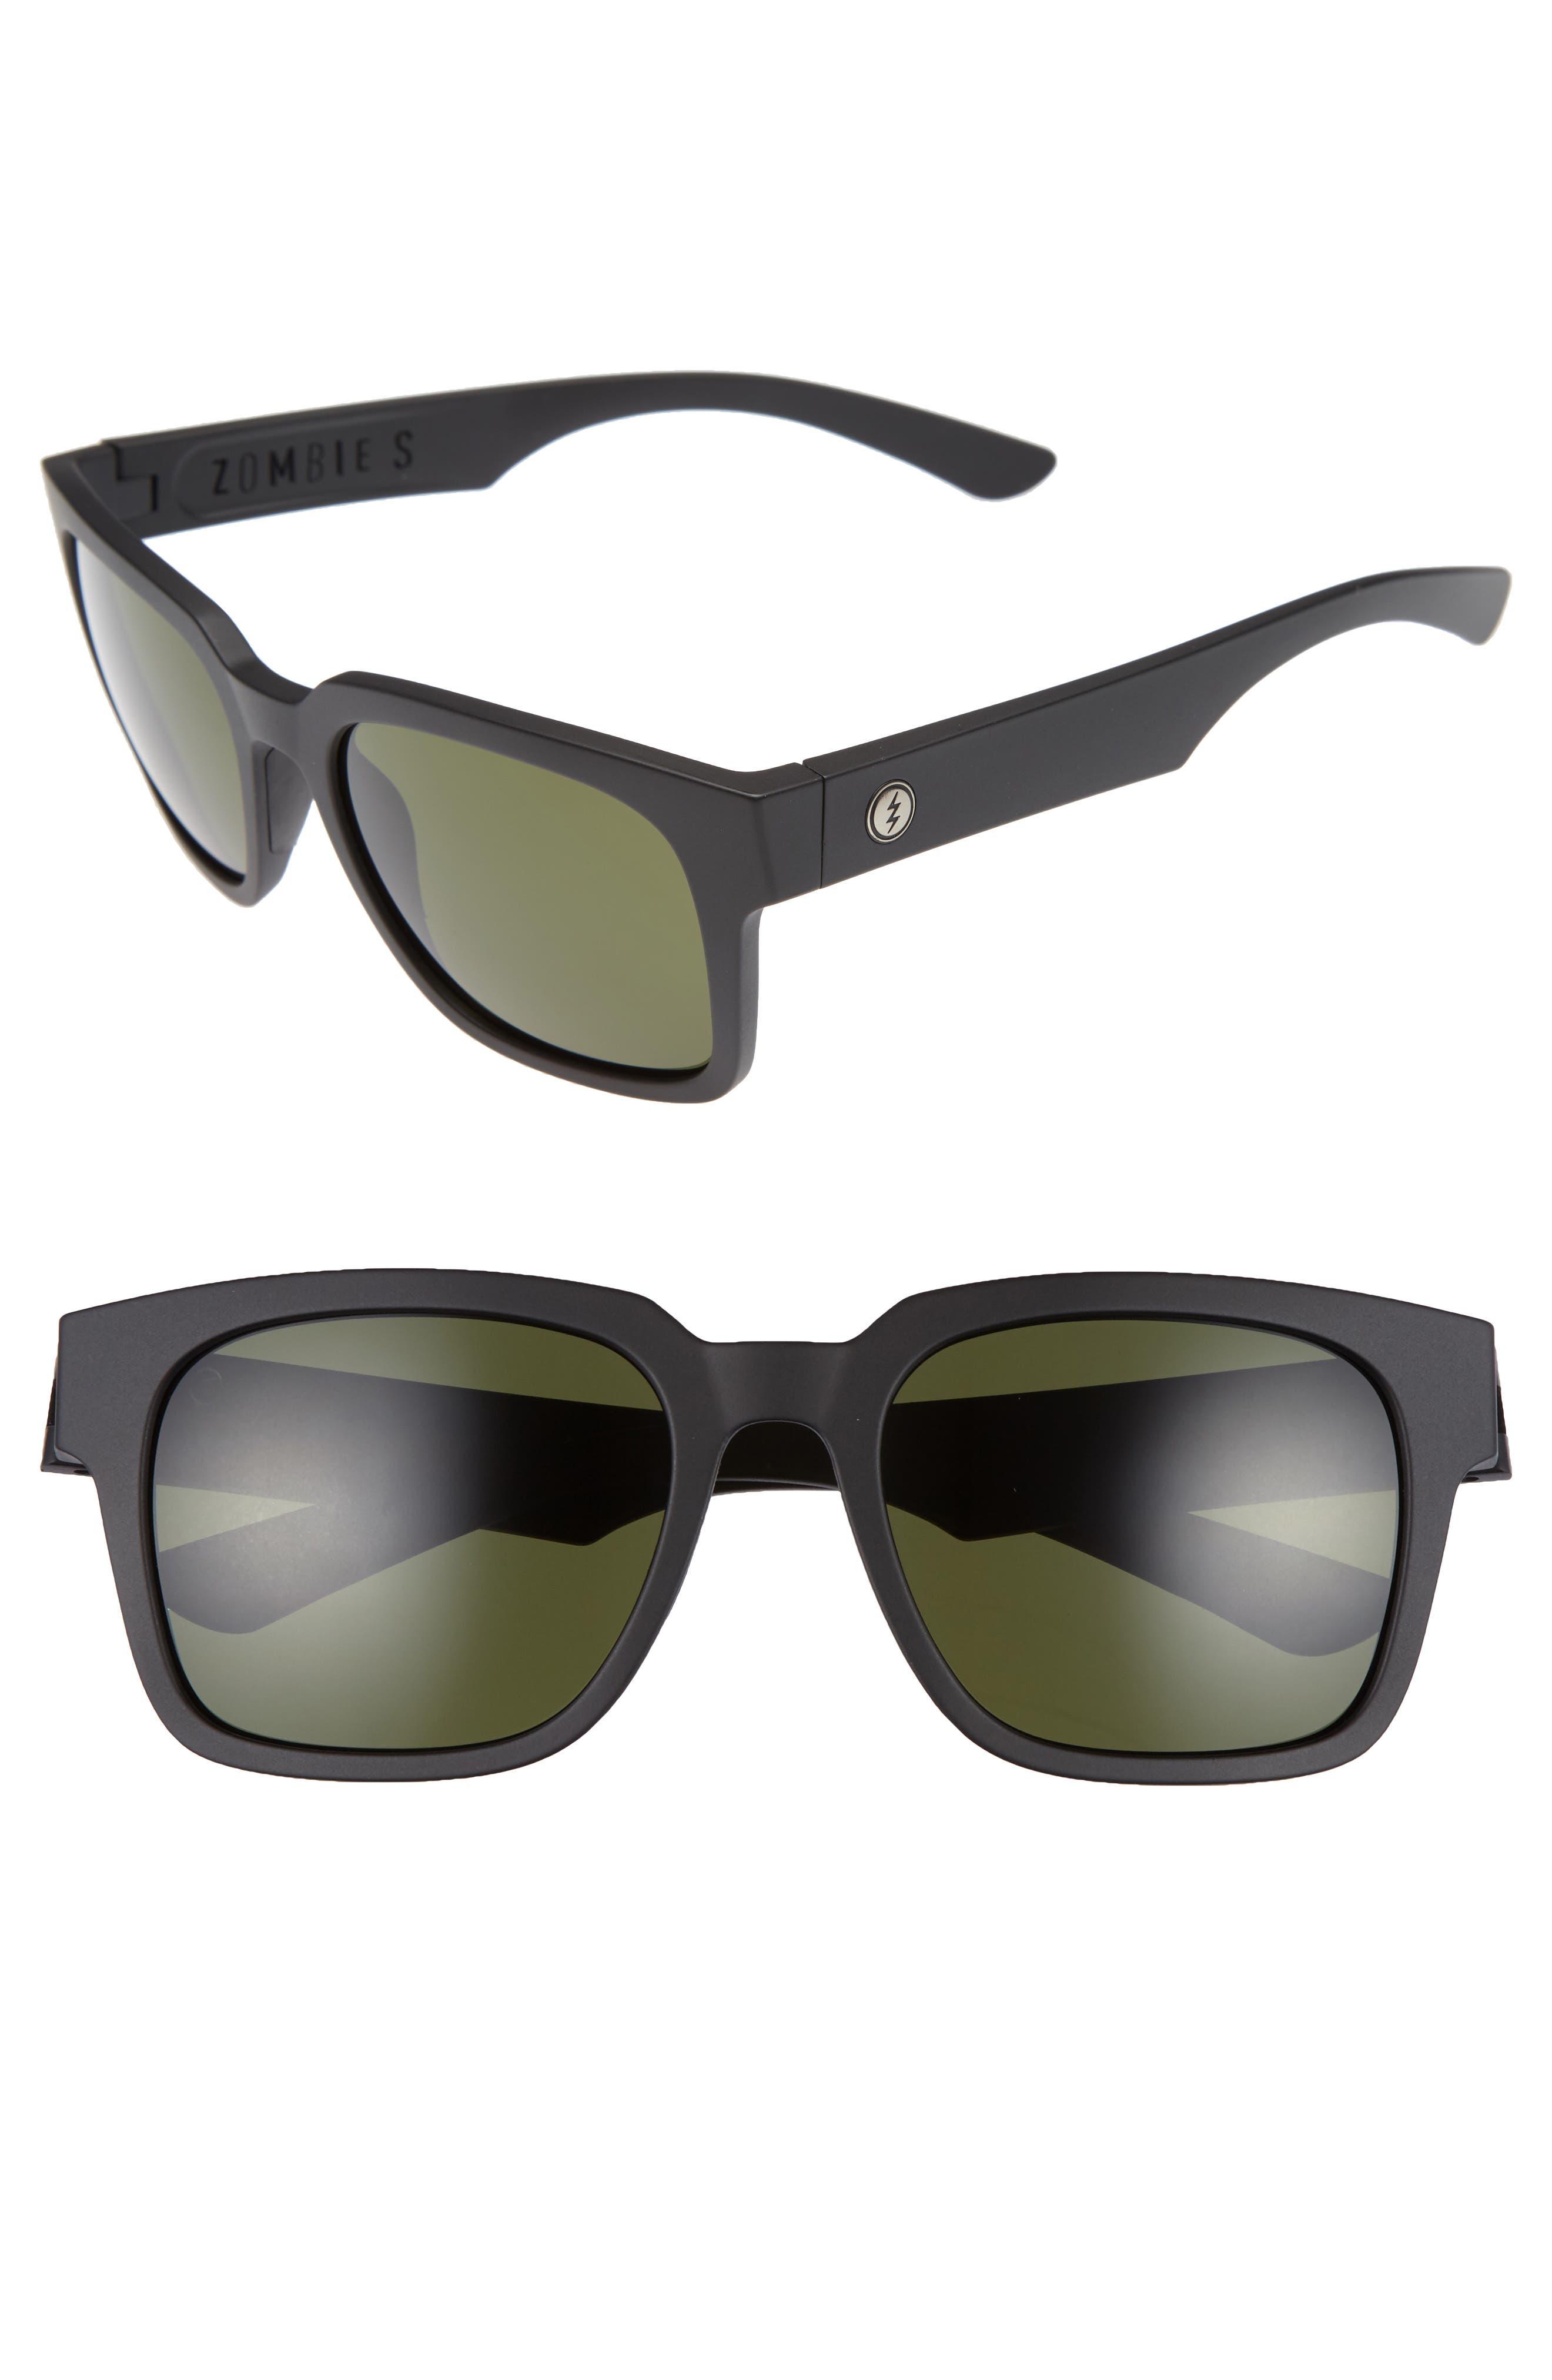 ELECTRIC Zombie S 52mm Sunglasses